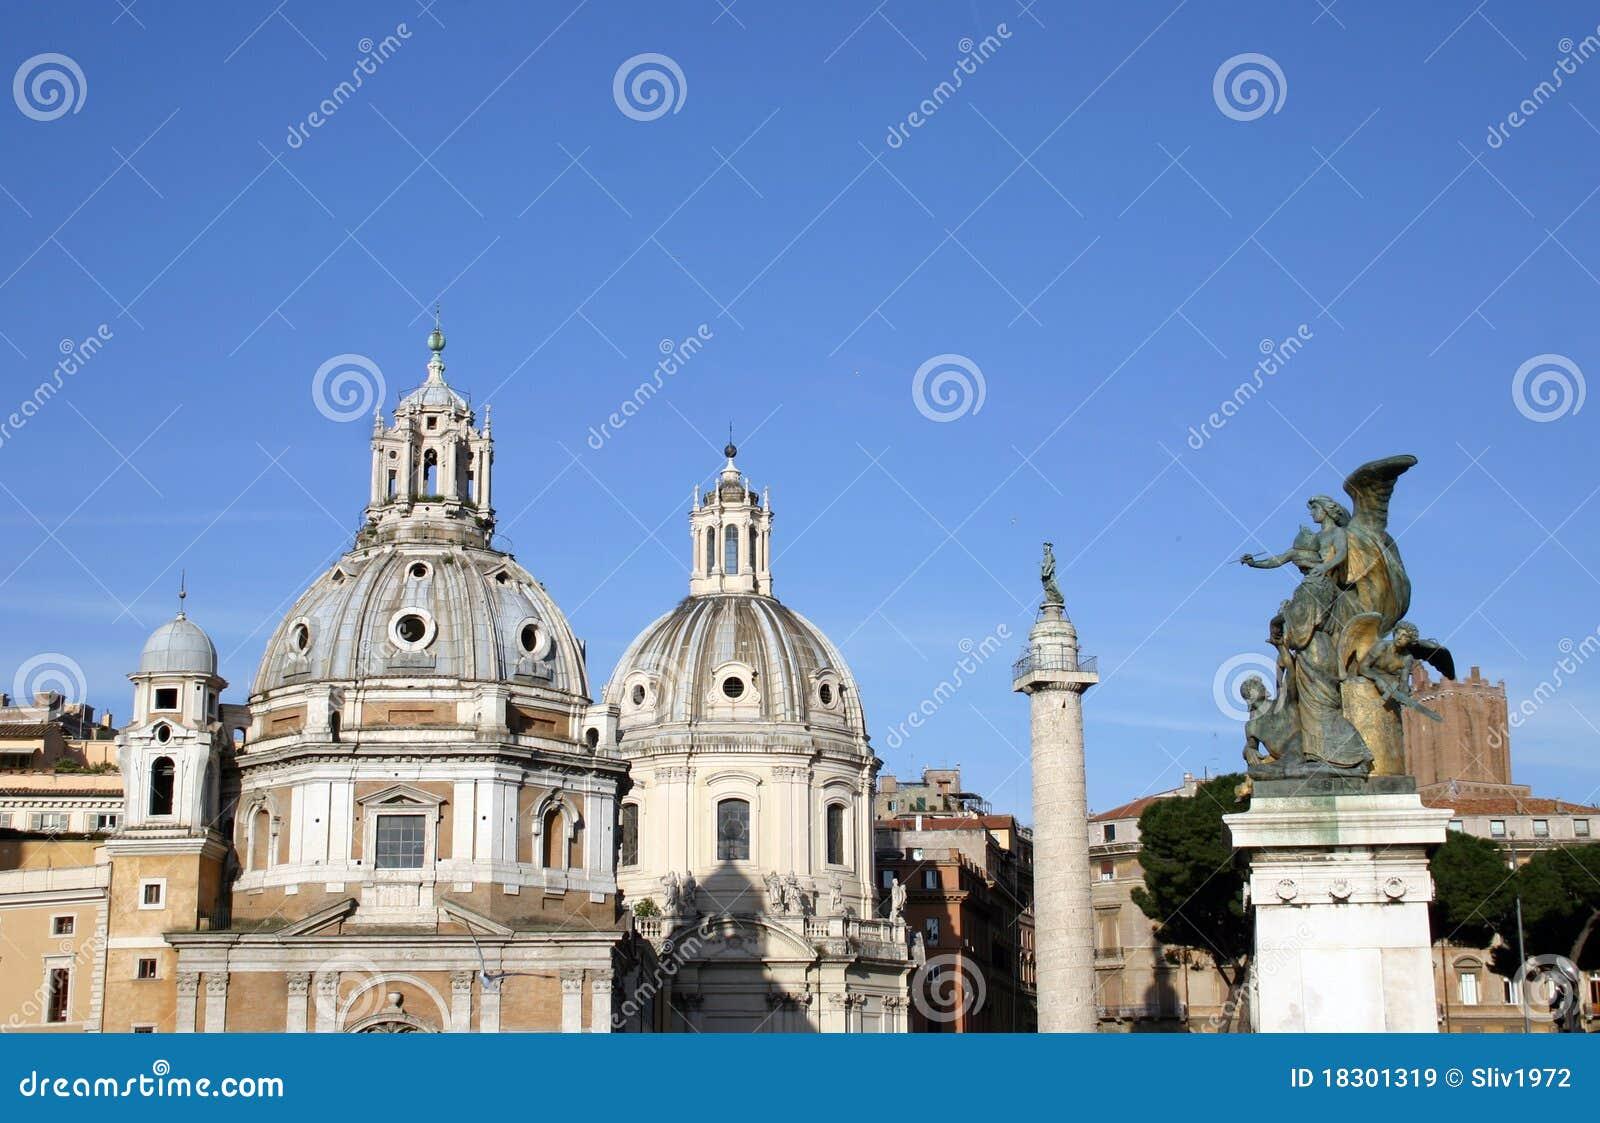 Venezia s square in Rome